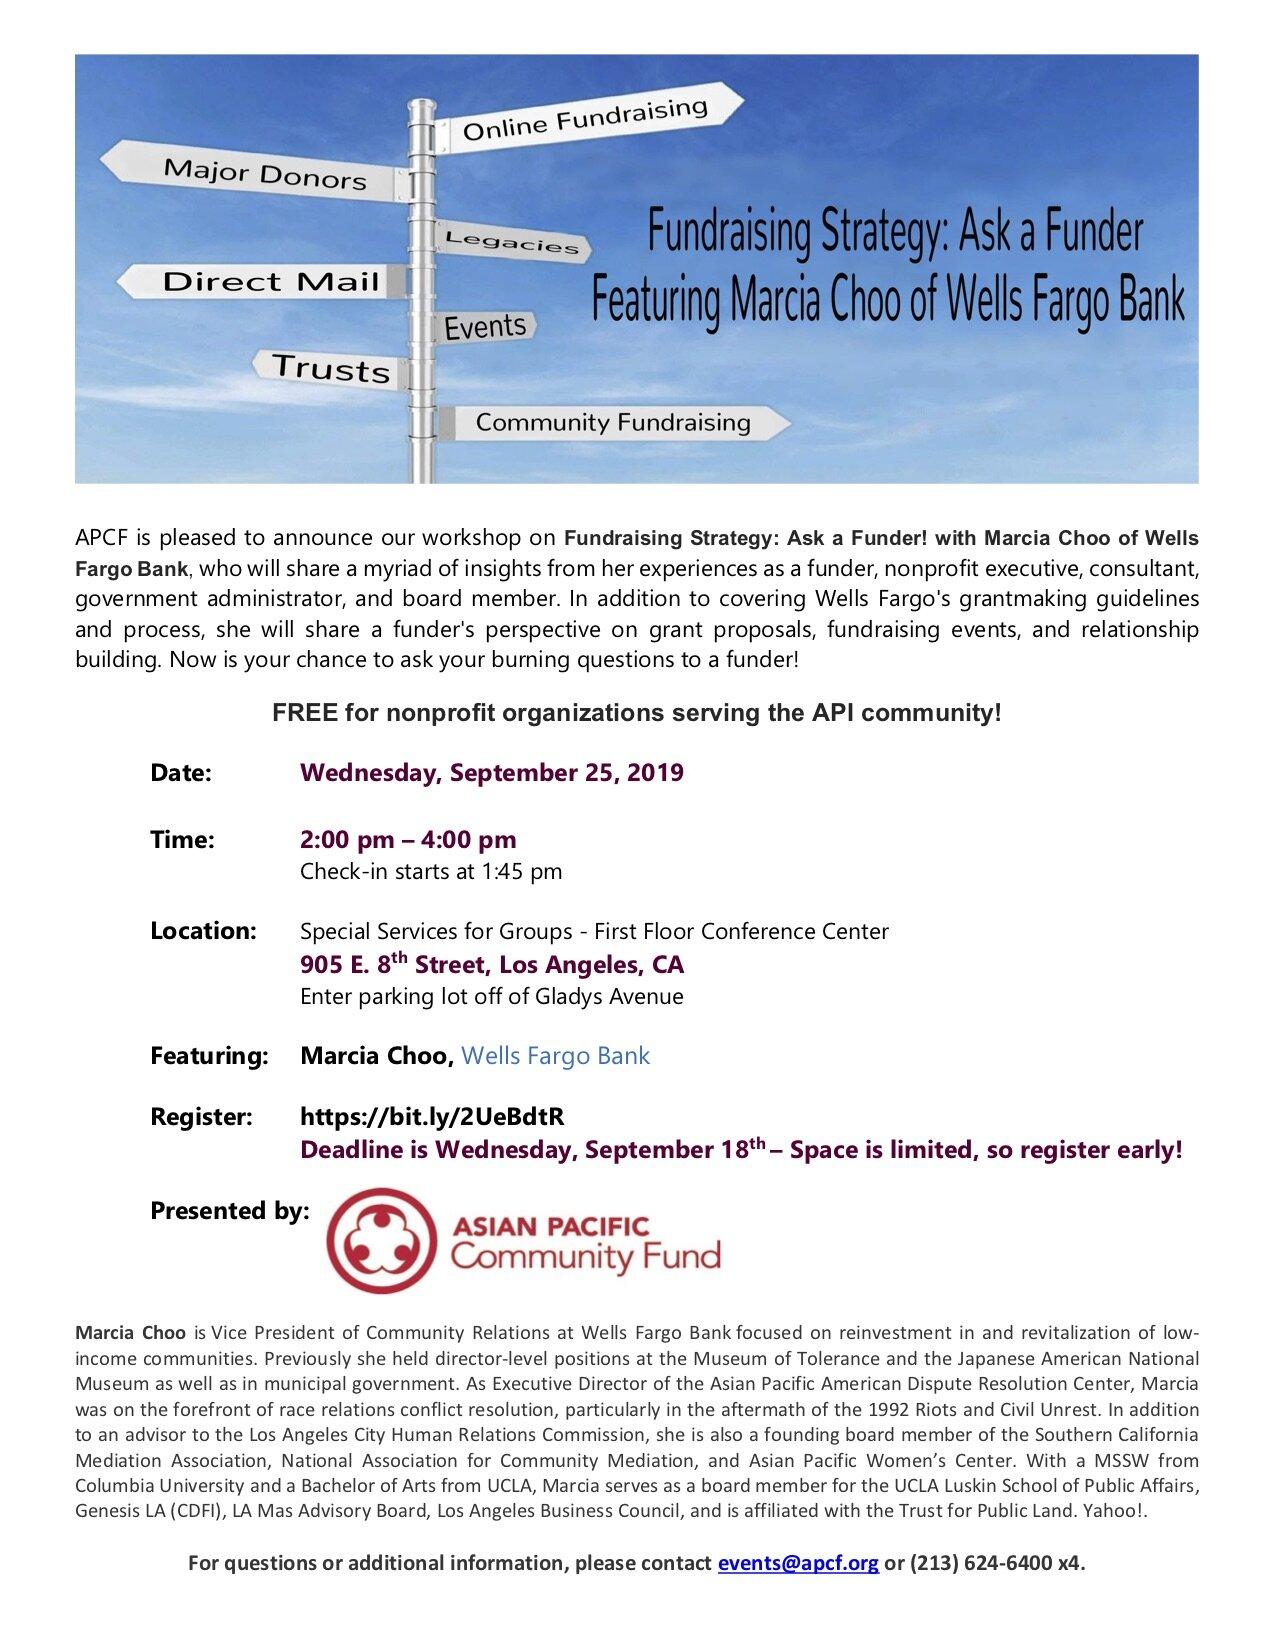 Fundraising Strategy Workshop Flier.jpg